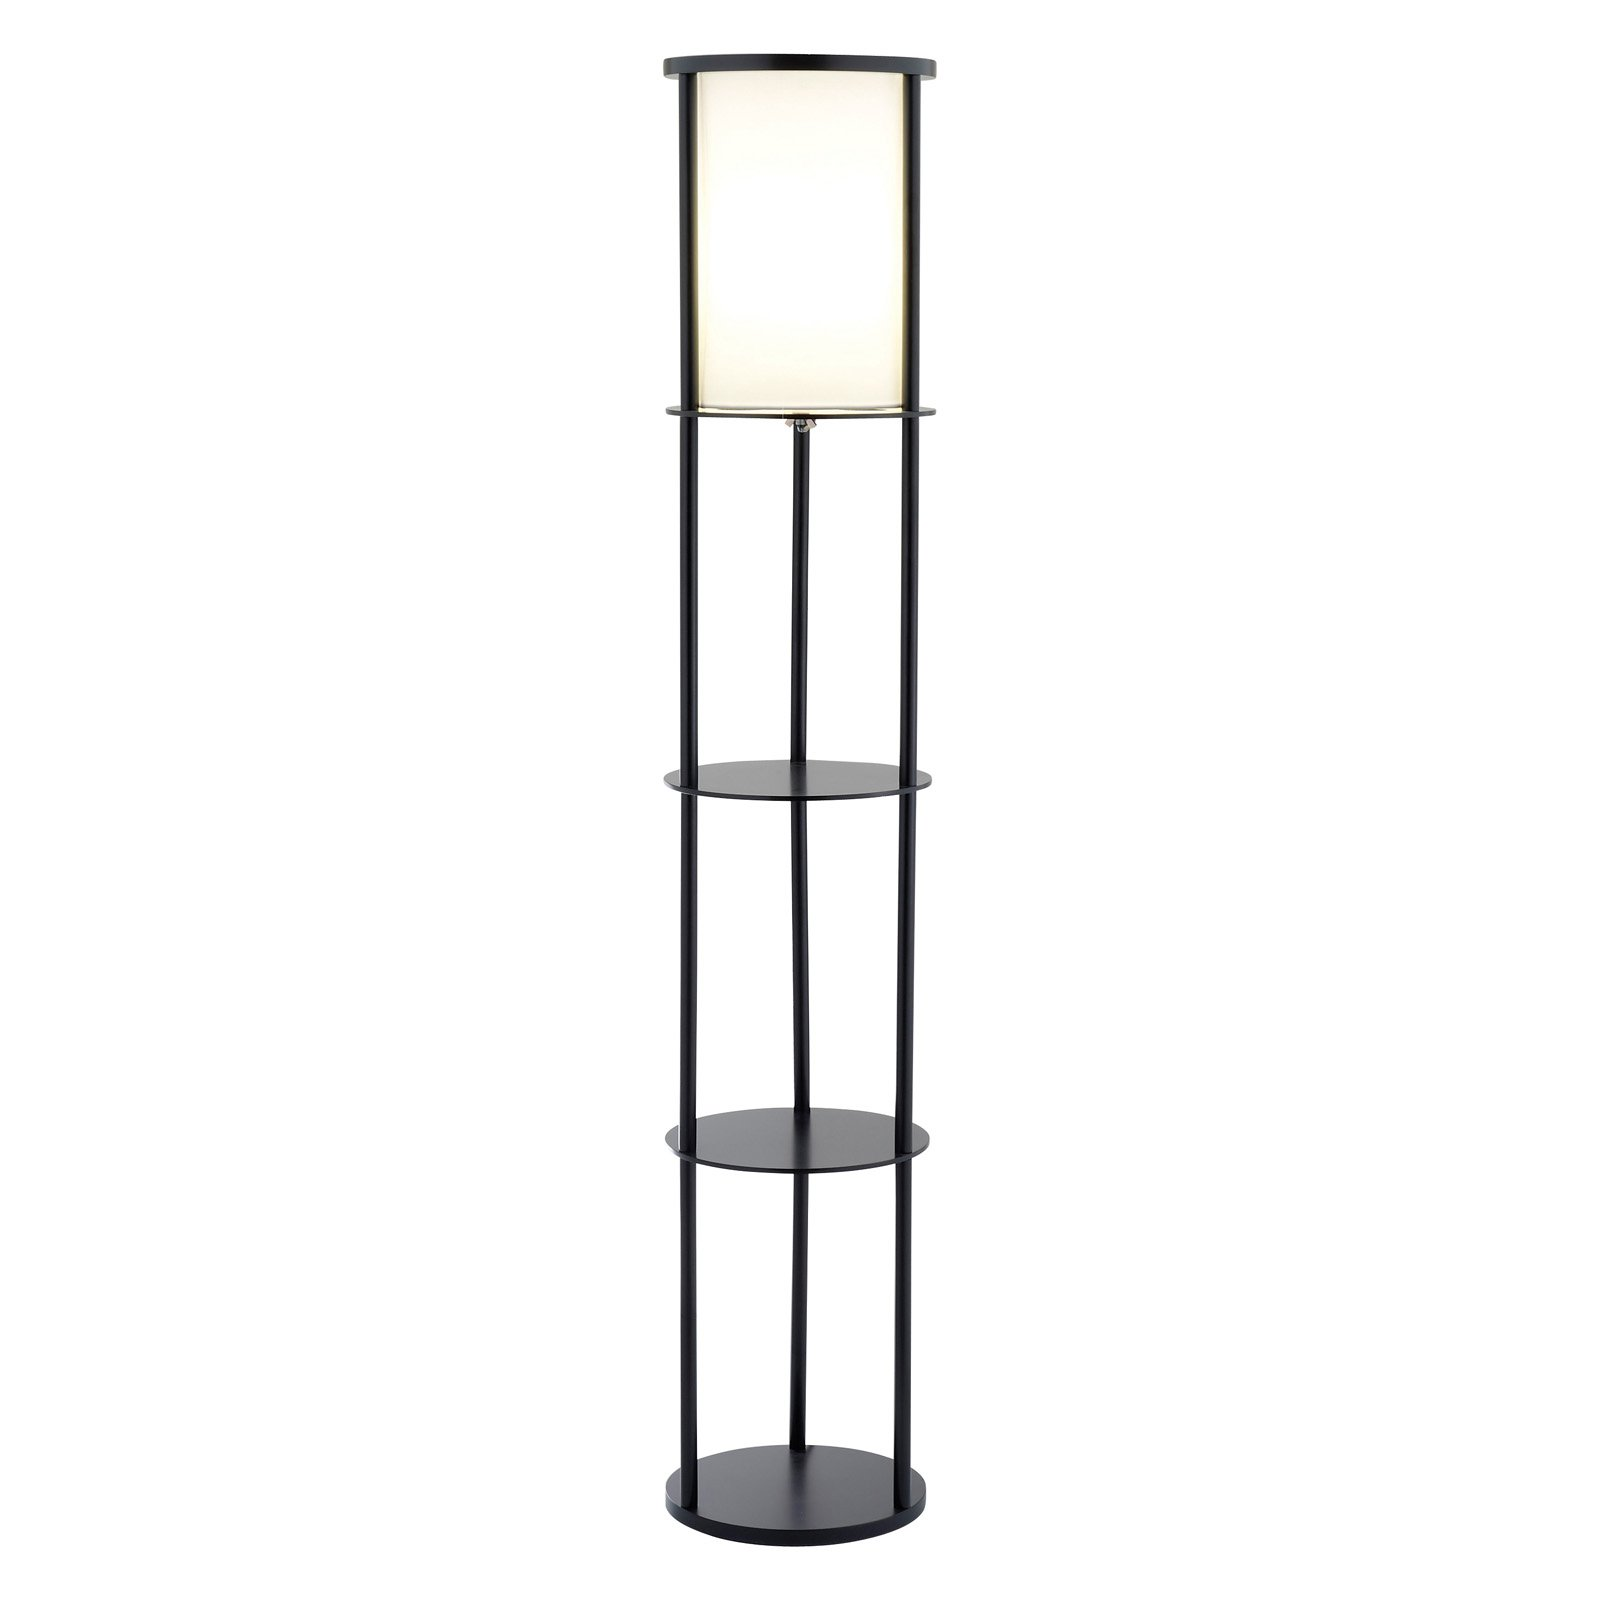 Adesso Stewart Shelf Floor Lamp by Adesso